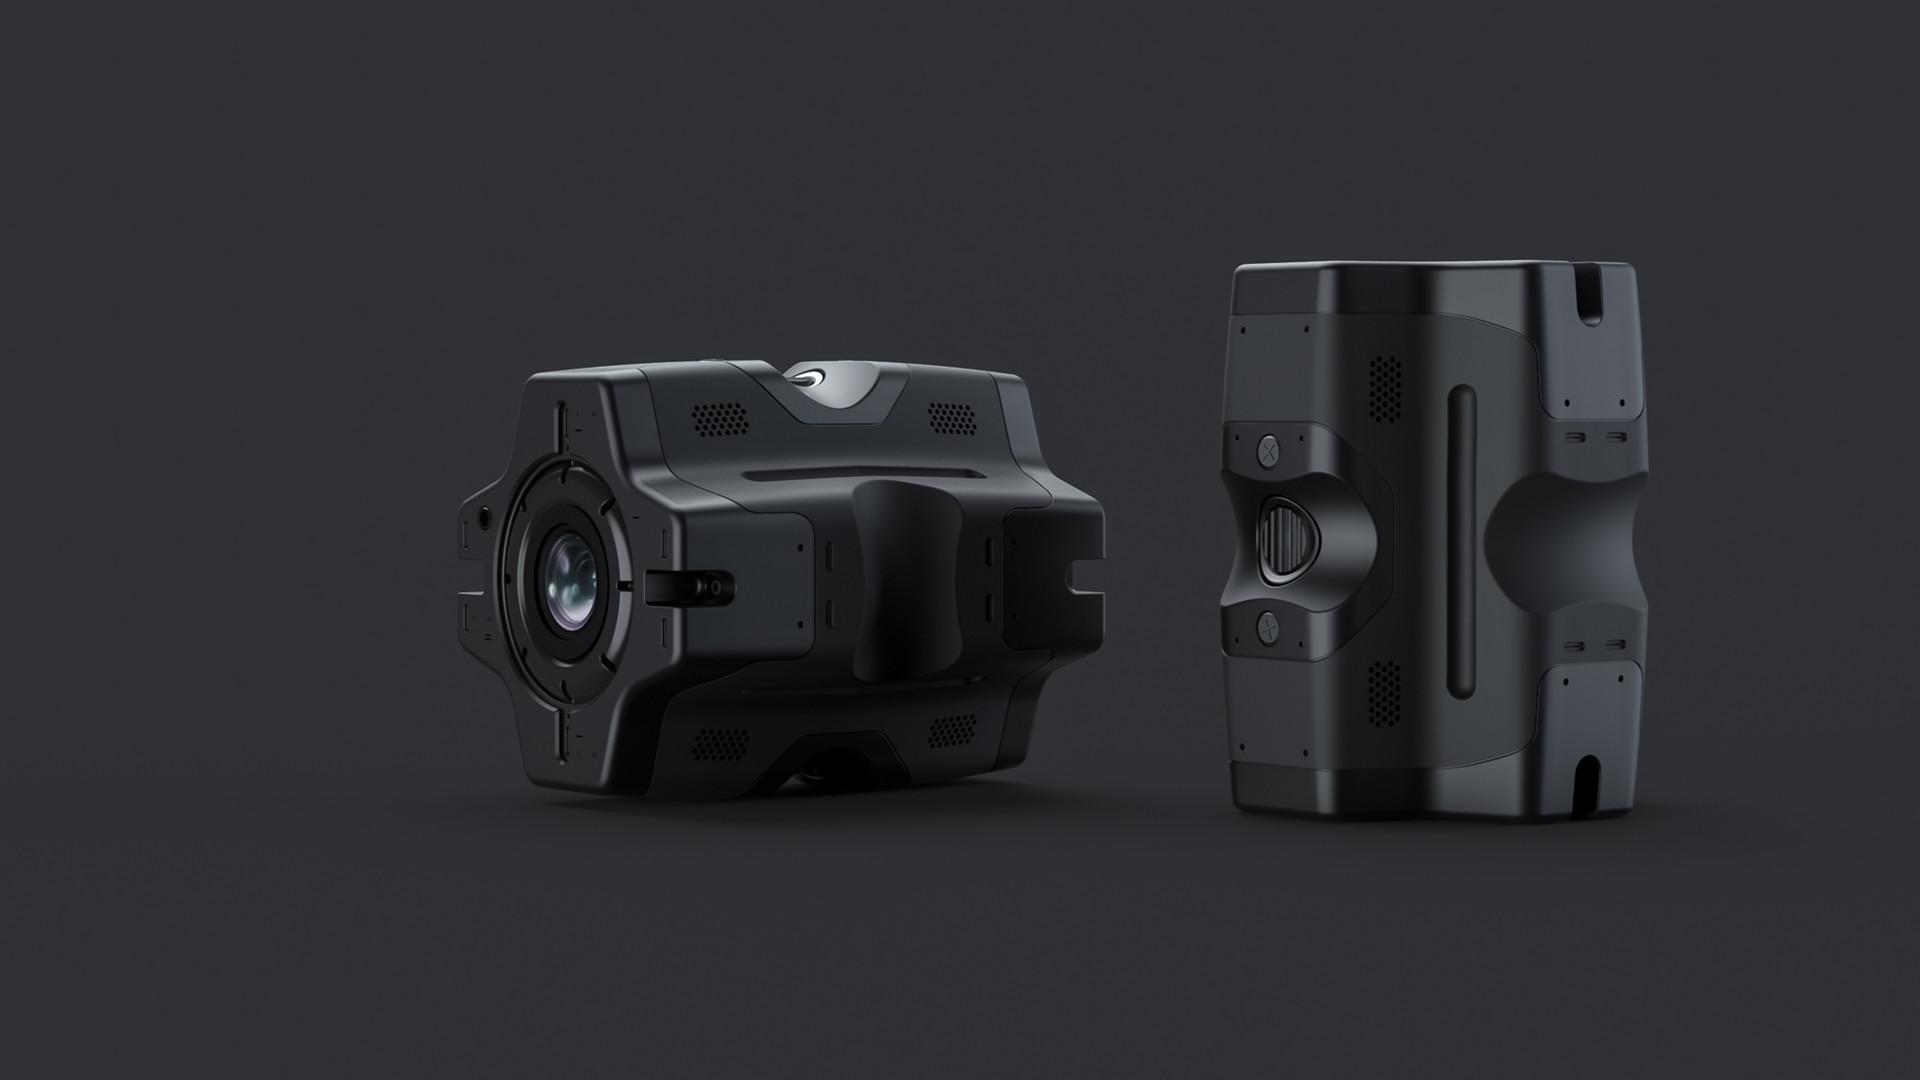 Roman tikhonov 3 camera 1 14